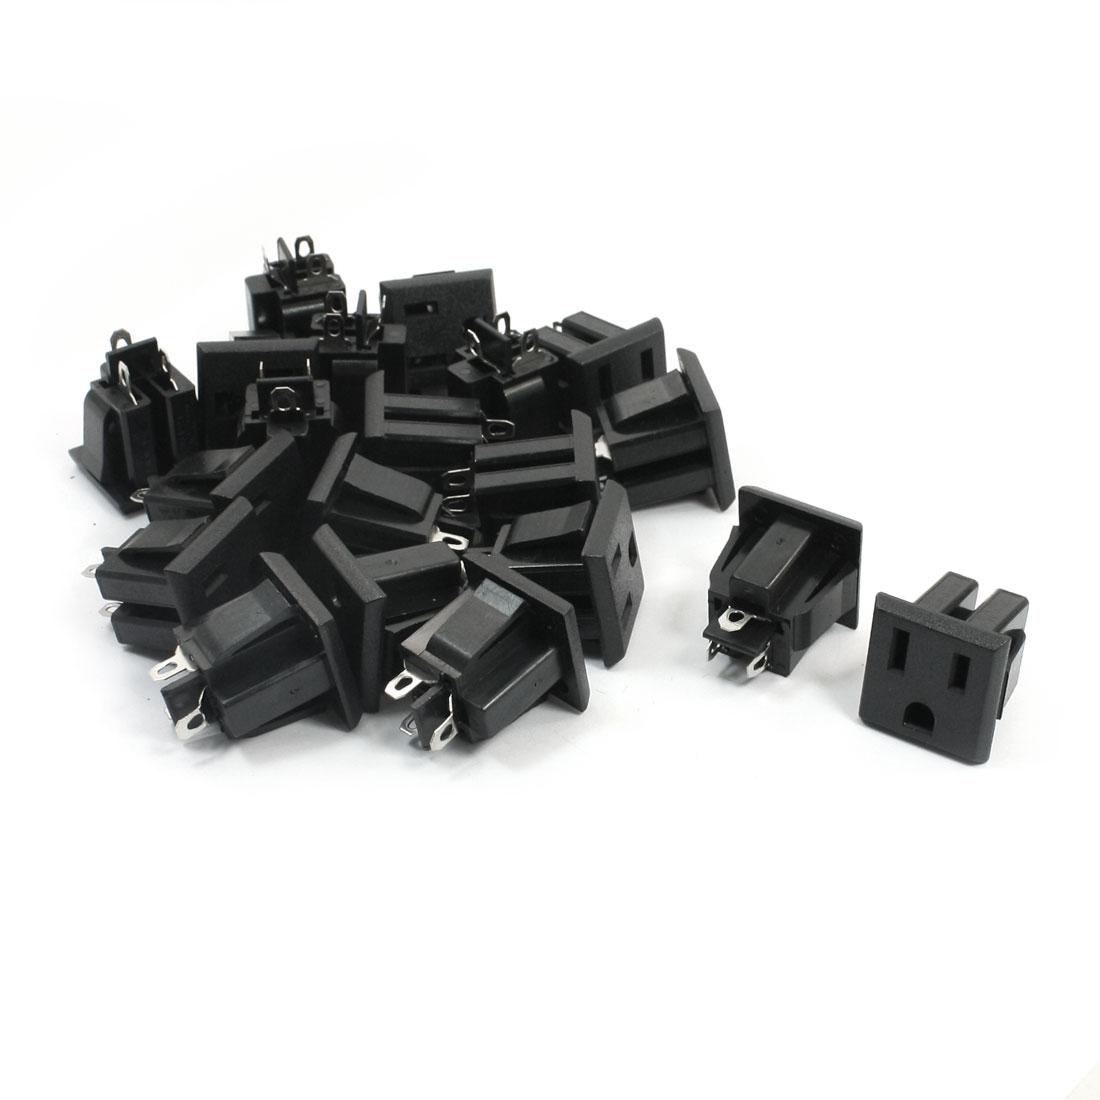 20Pcs US Plug Socket Soldering Power Adapter Connector AC 125V 15A